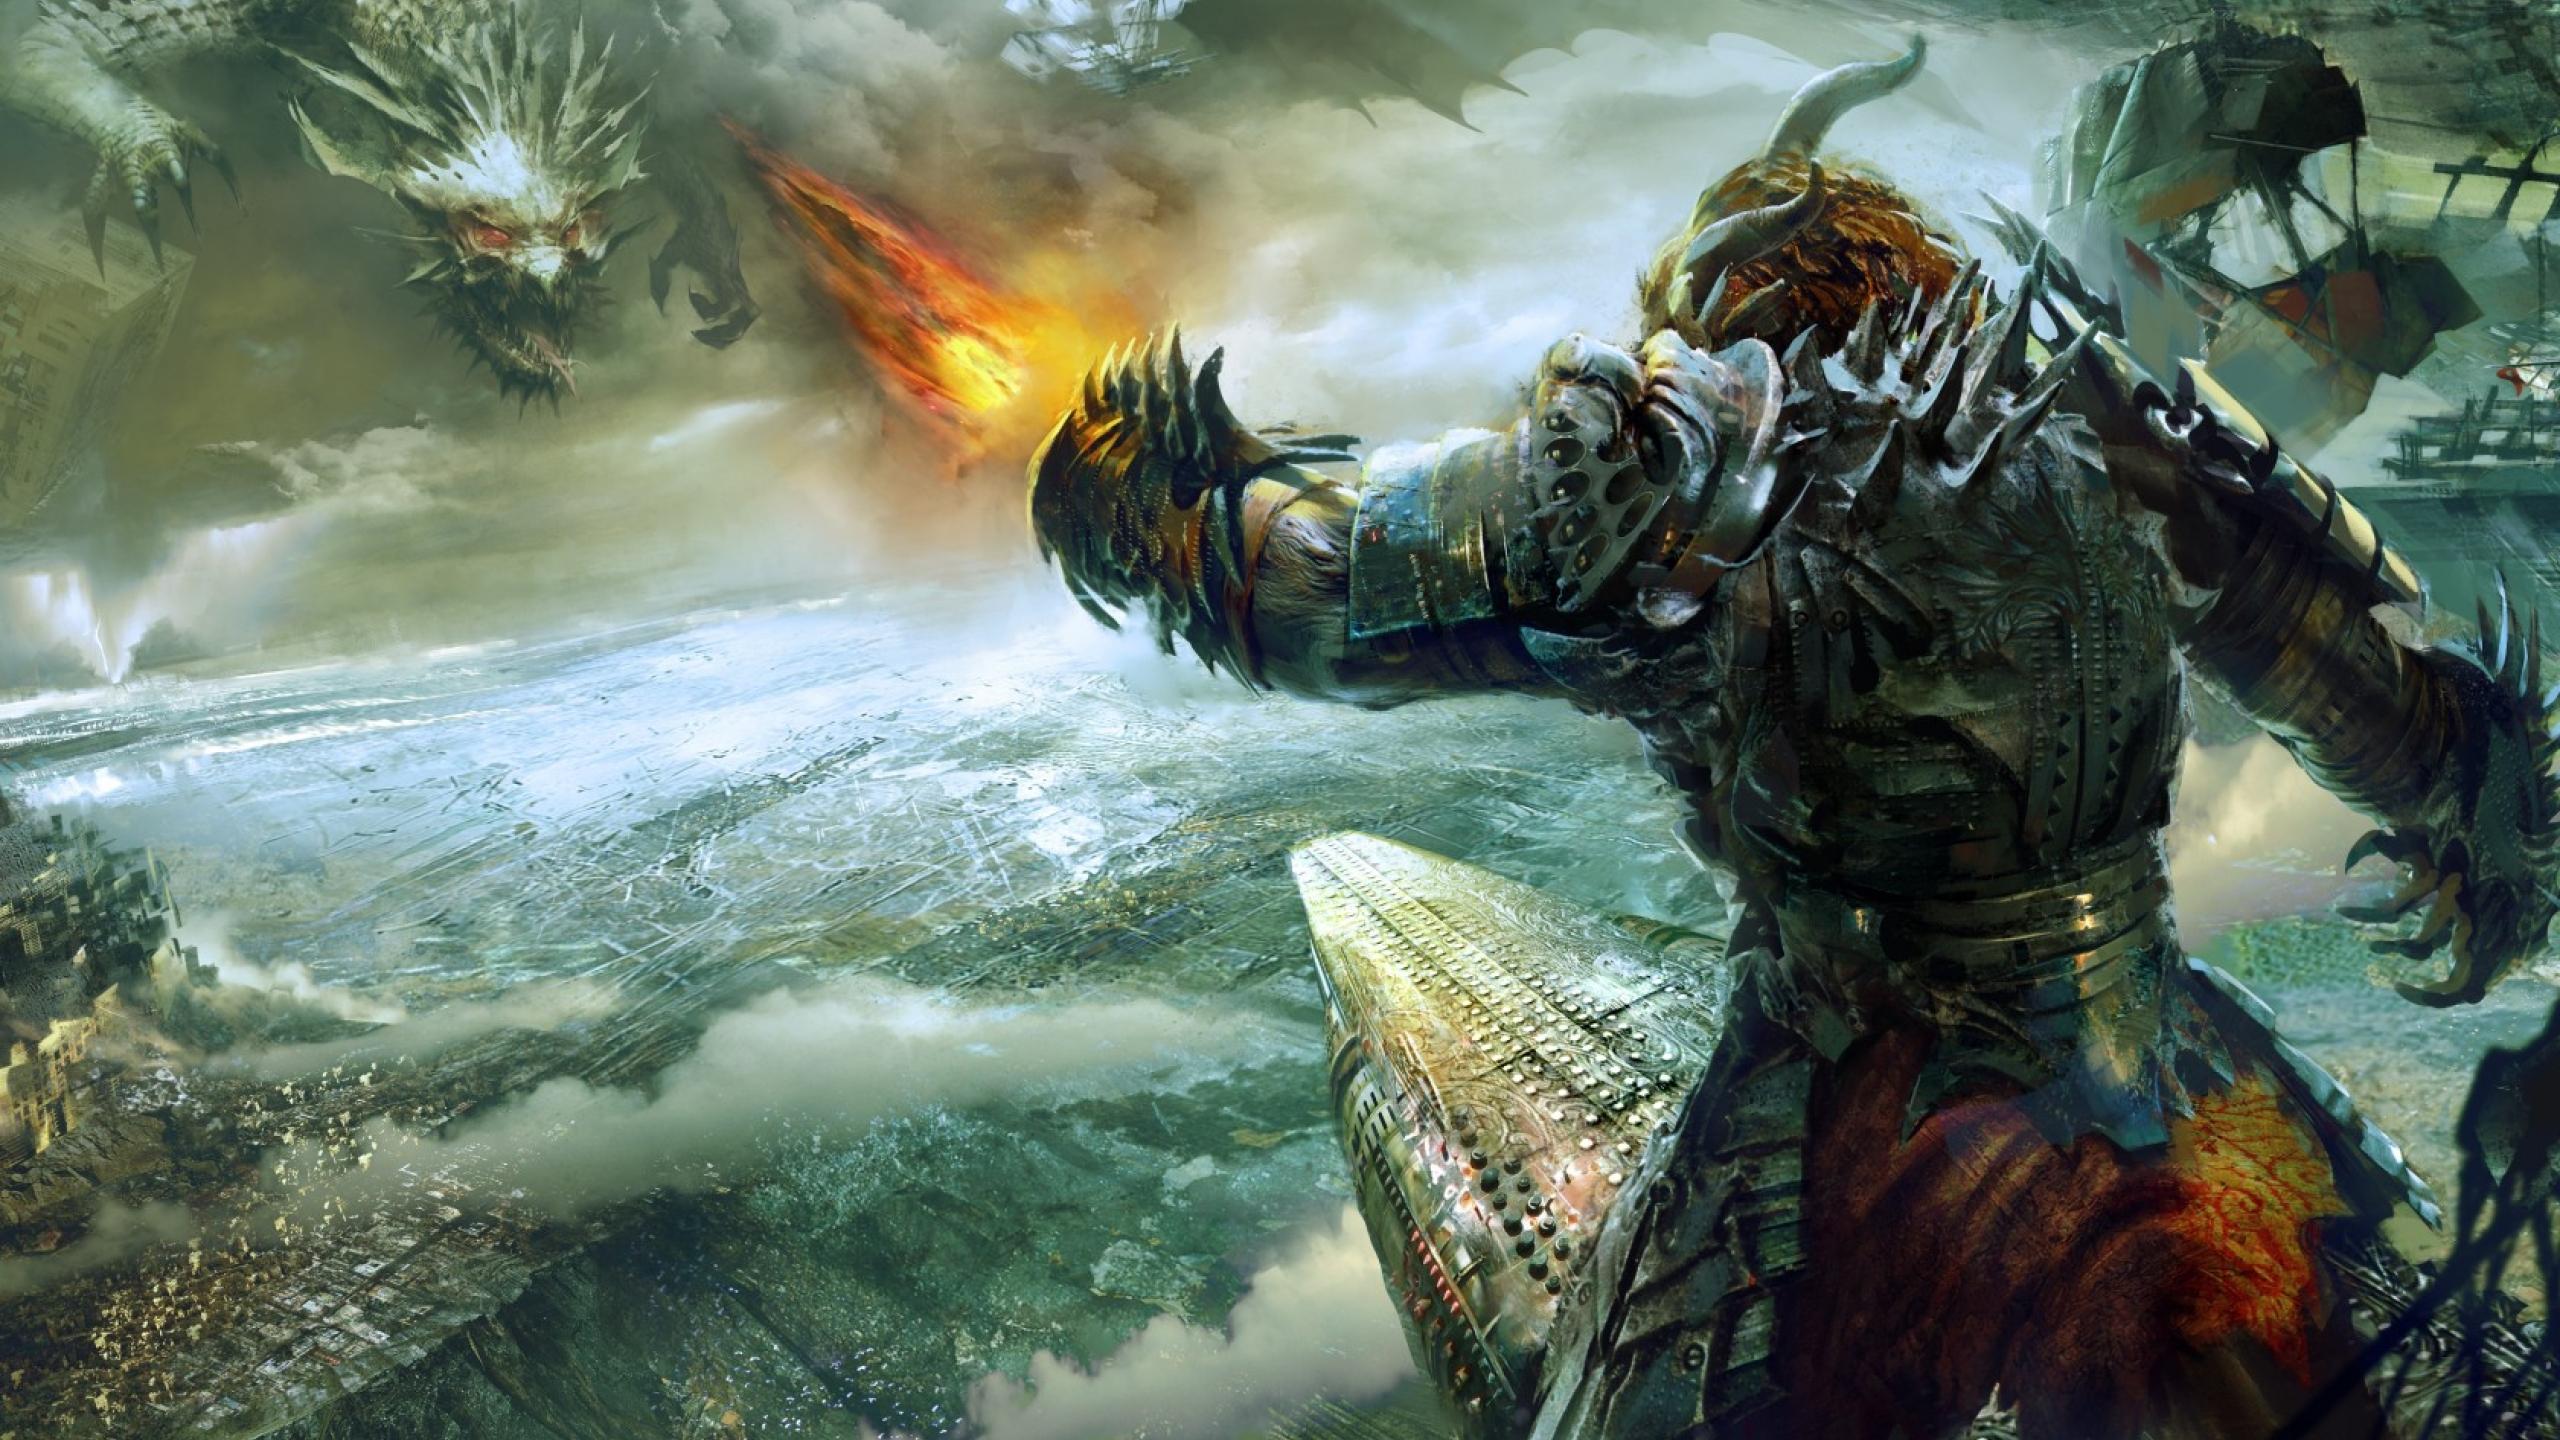 2560x1440 Guild Wars 2 Heart Of Thorns Battle 1440p Resolution